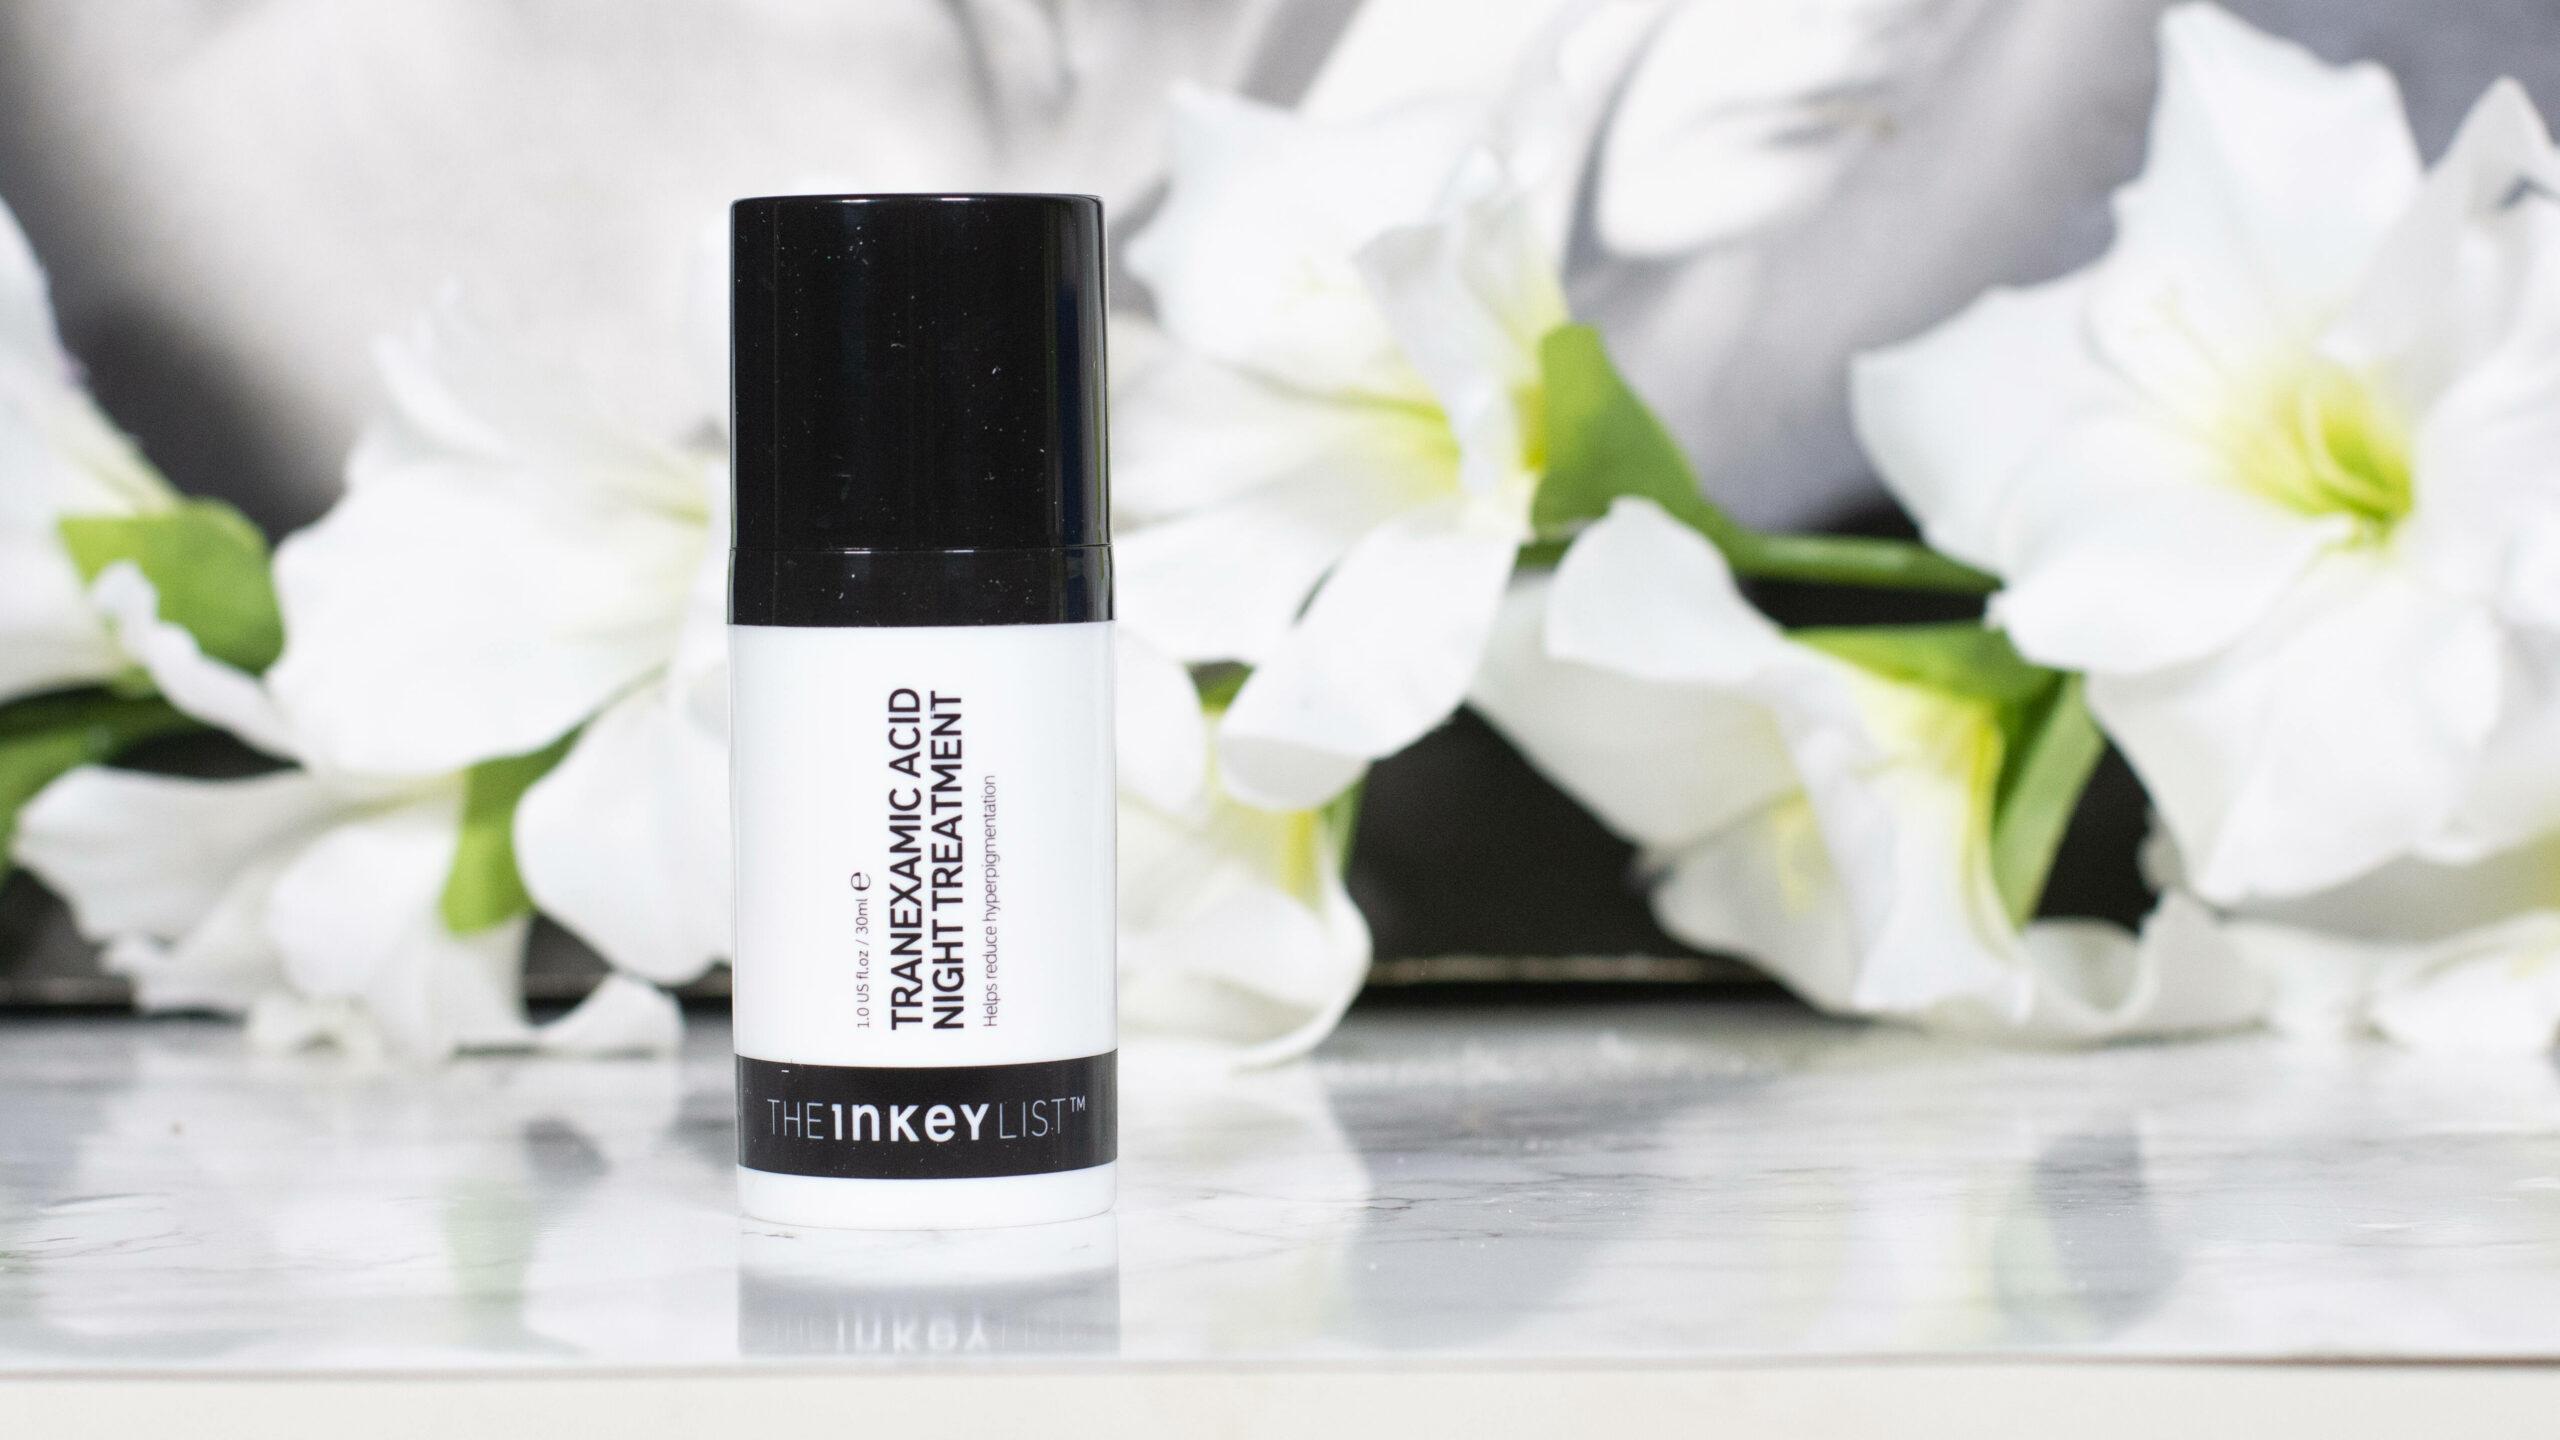 The Inkey List Tranexamic Acid Night Treatment Review - your secret weapon against hyperpigmentation?